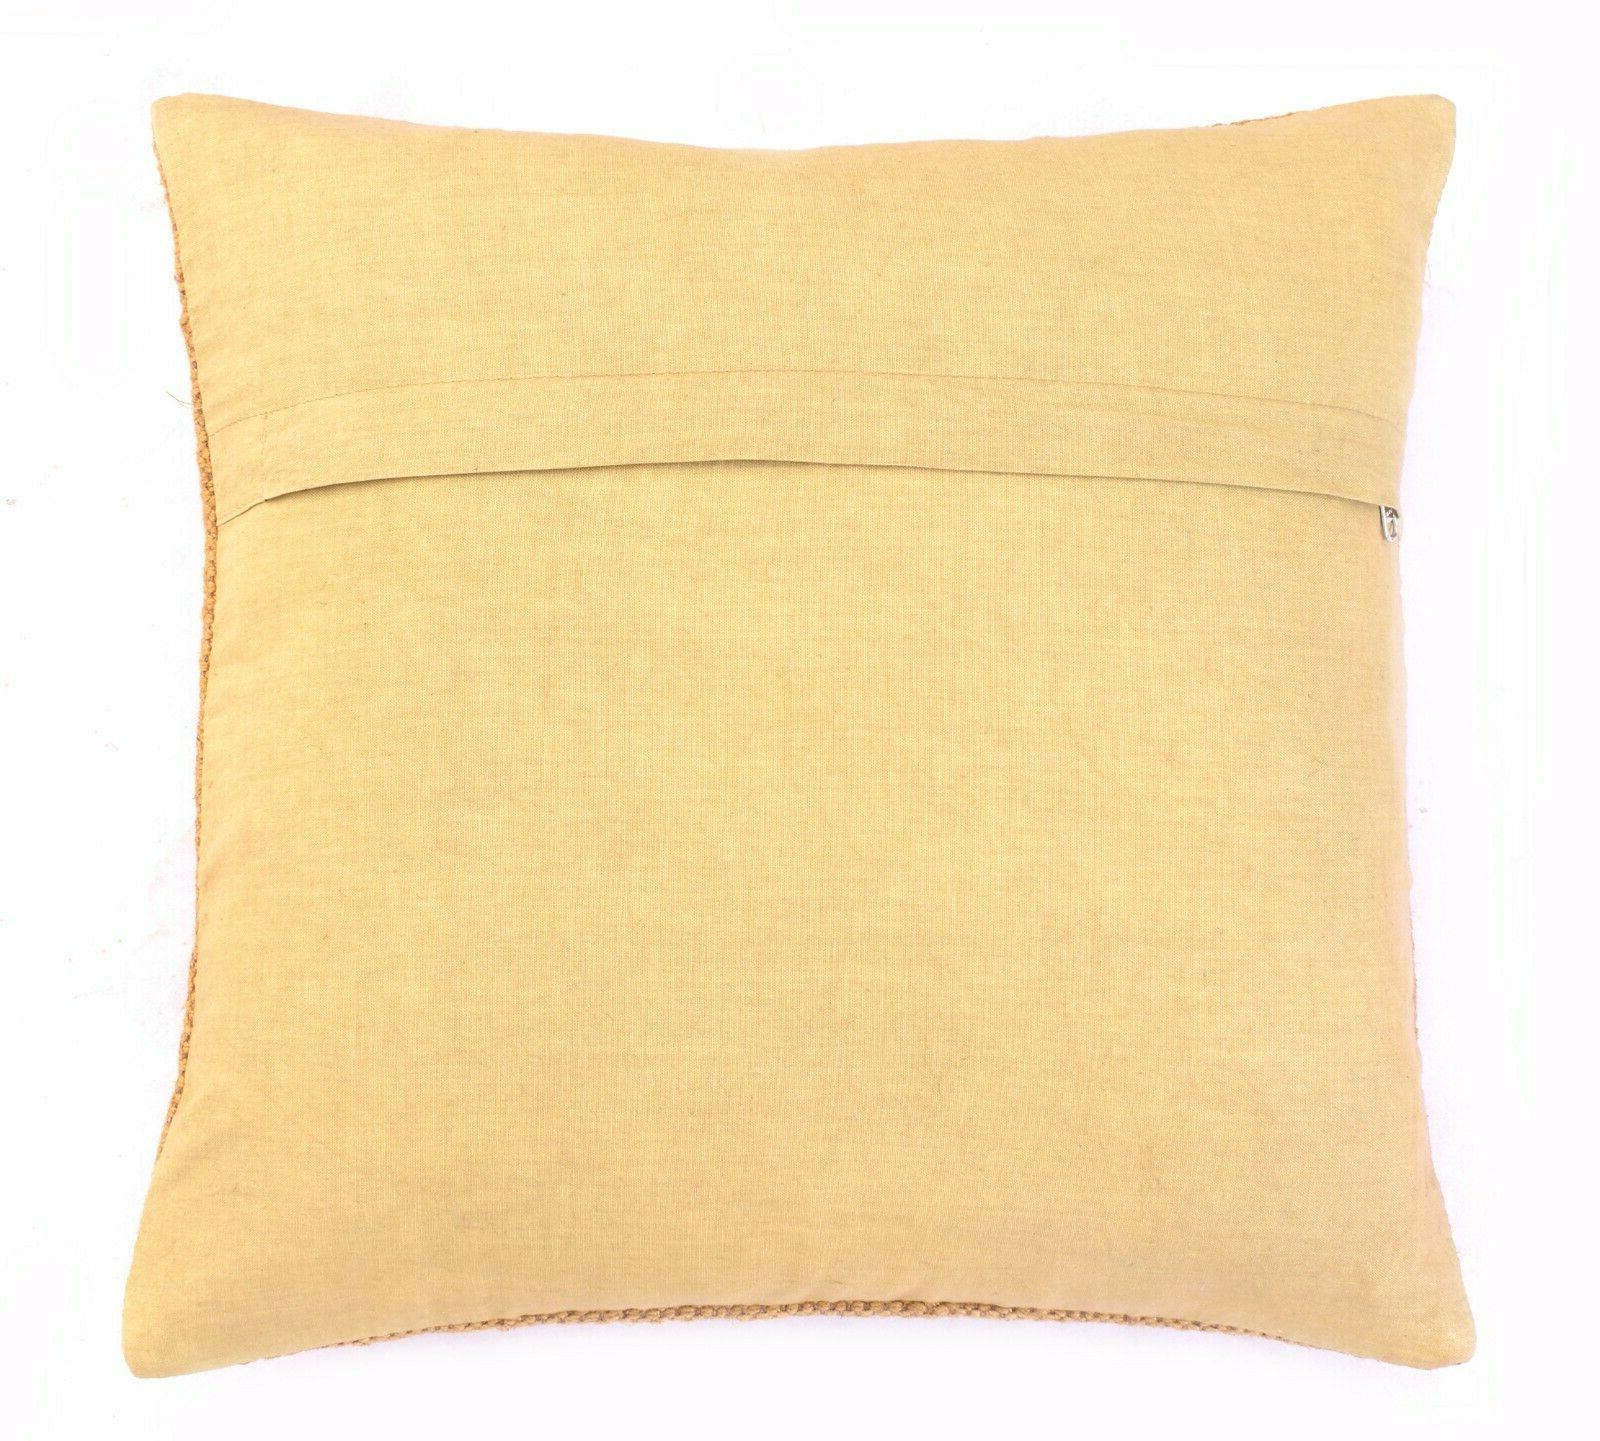 Set of 5 Cushion Cover Pillow Case Floor Sofa Cushion